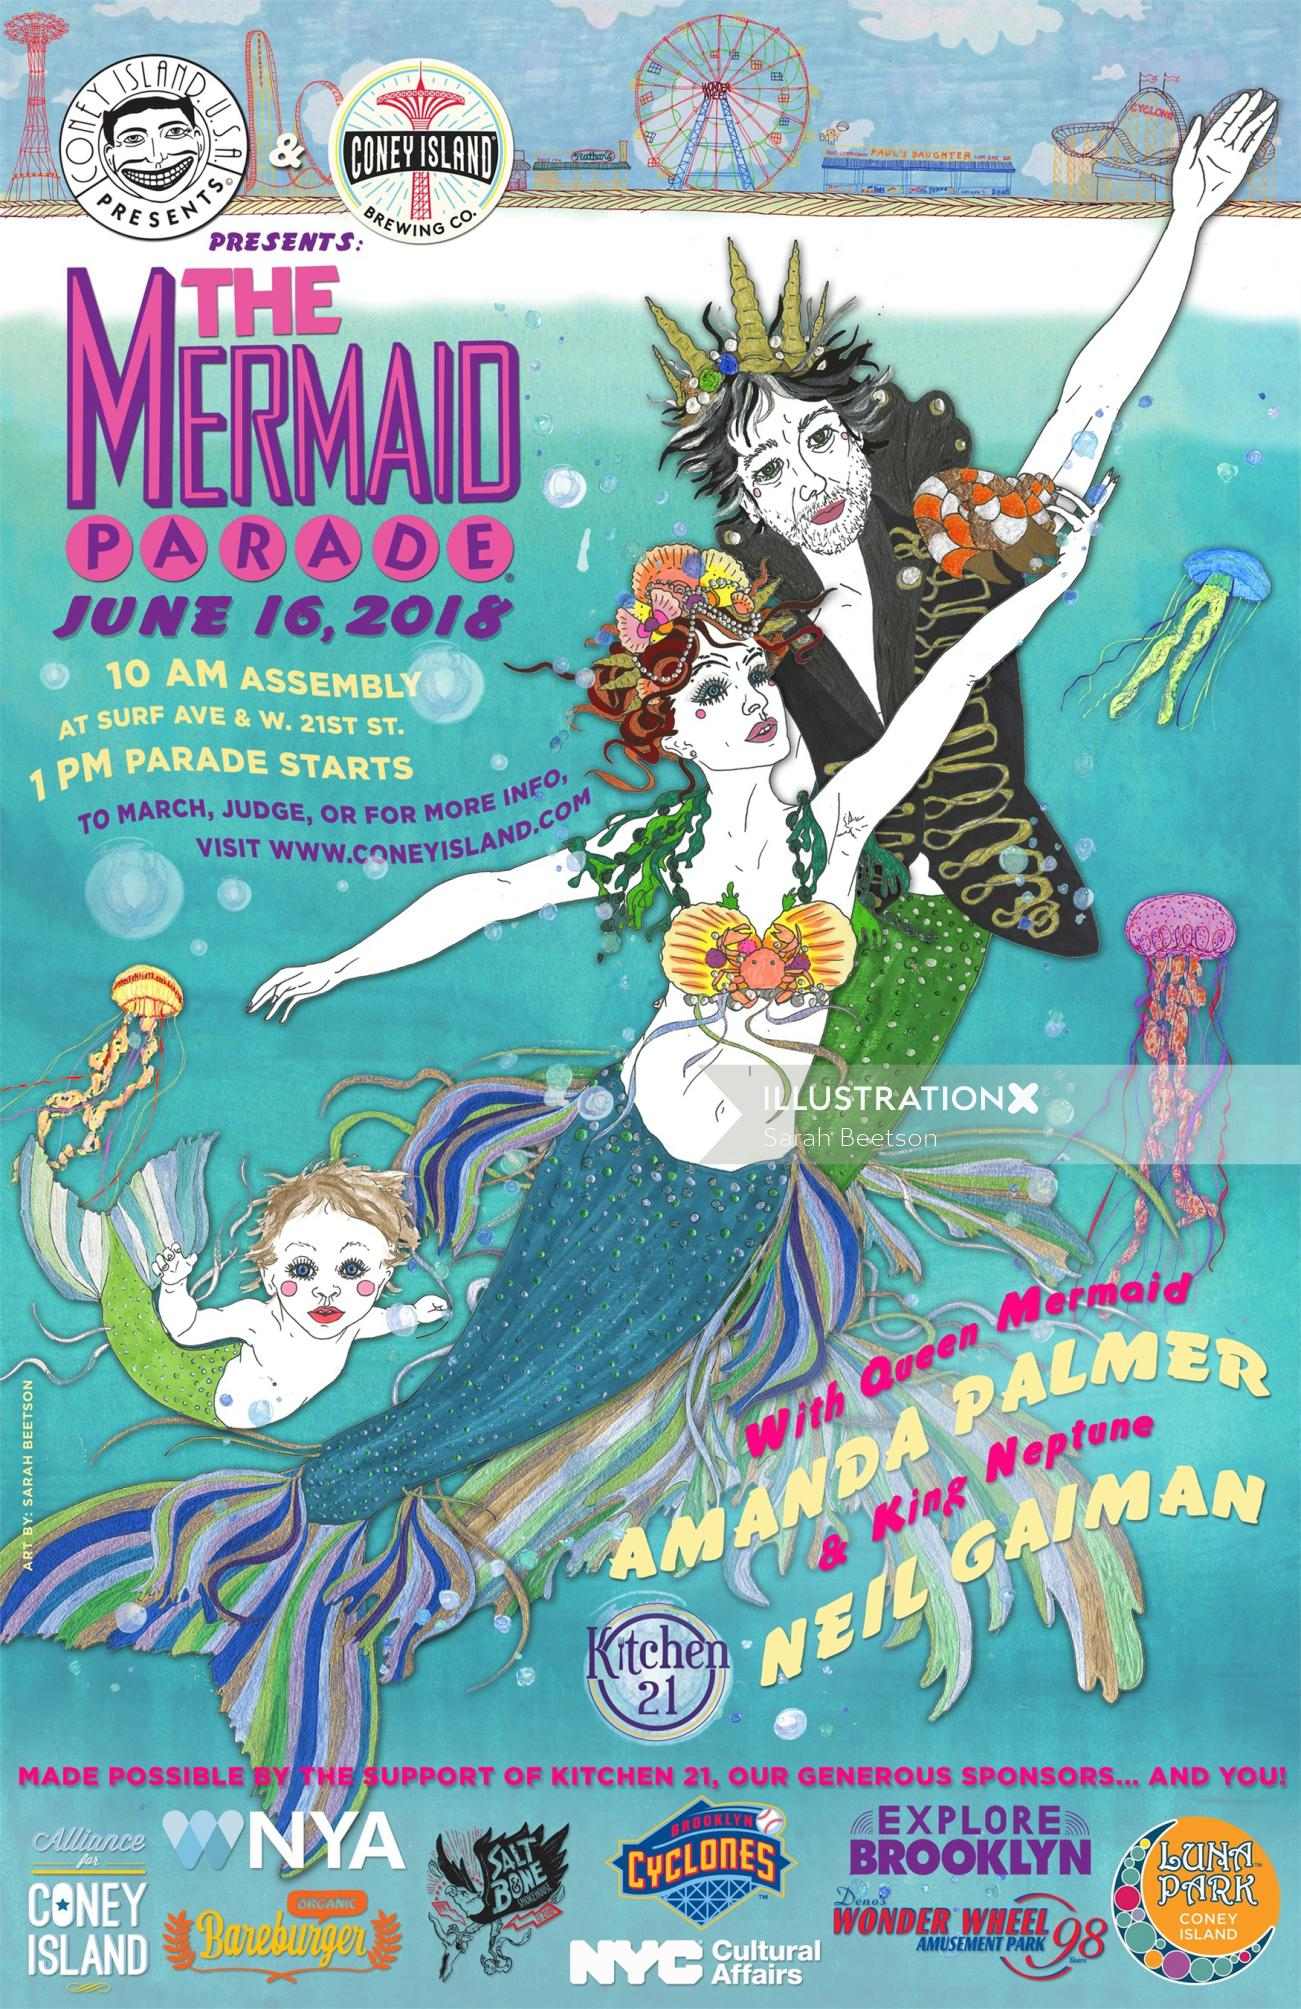 Graphic the mermaid parade